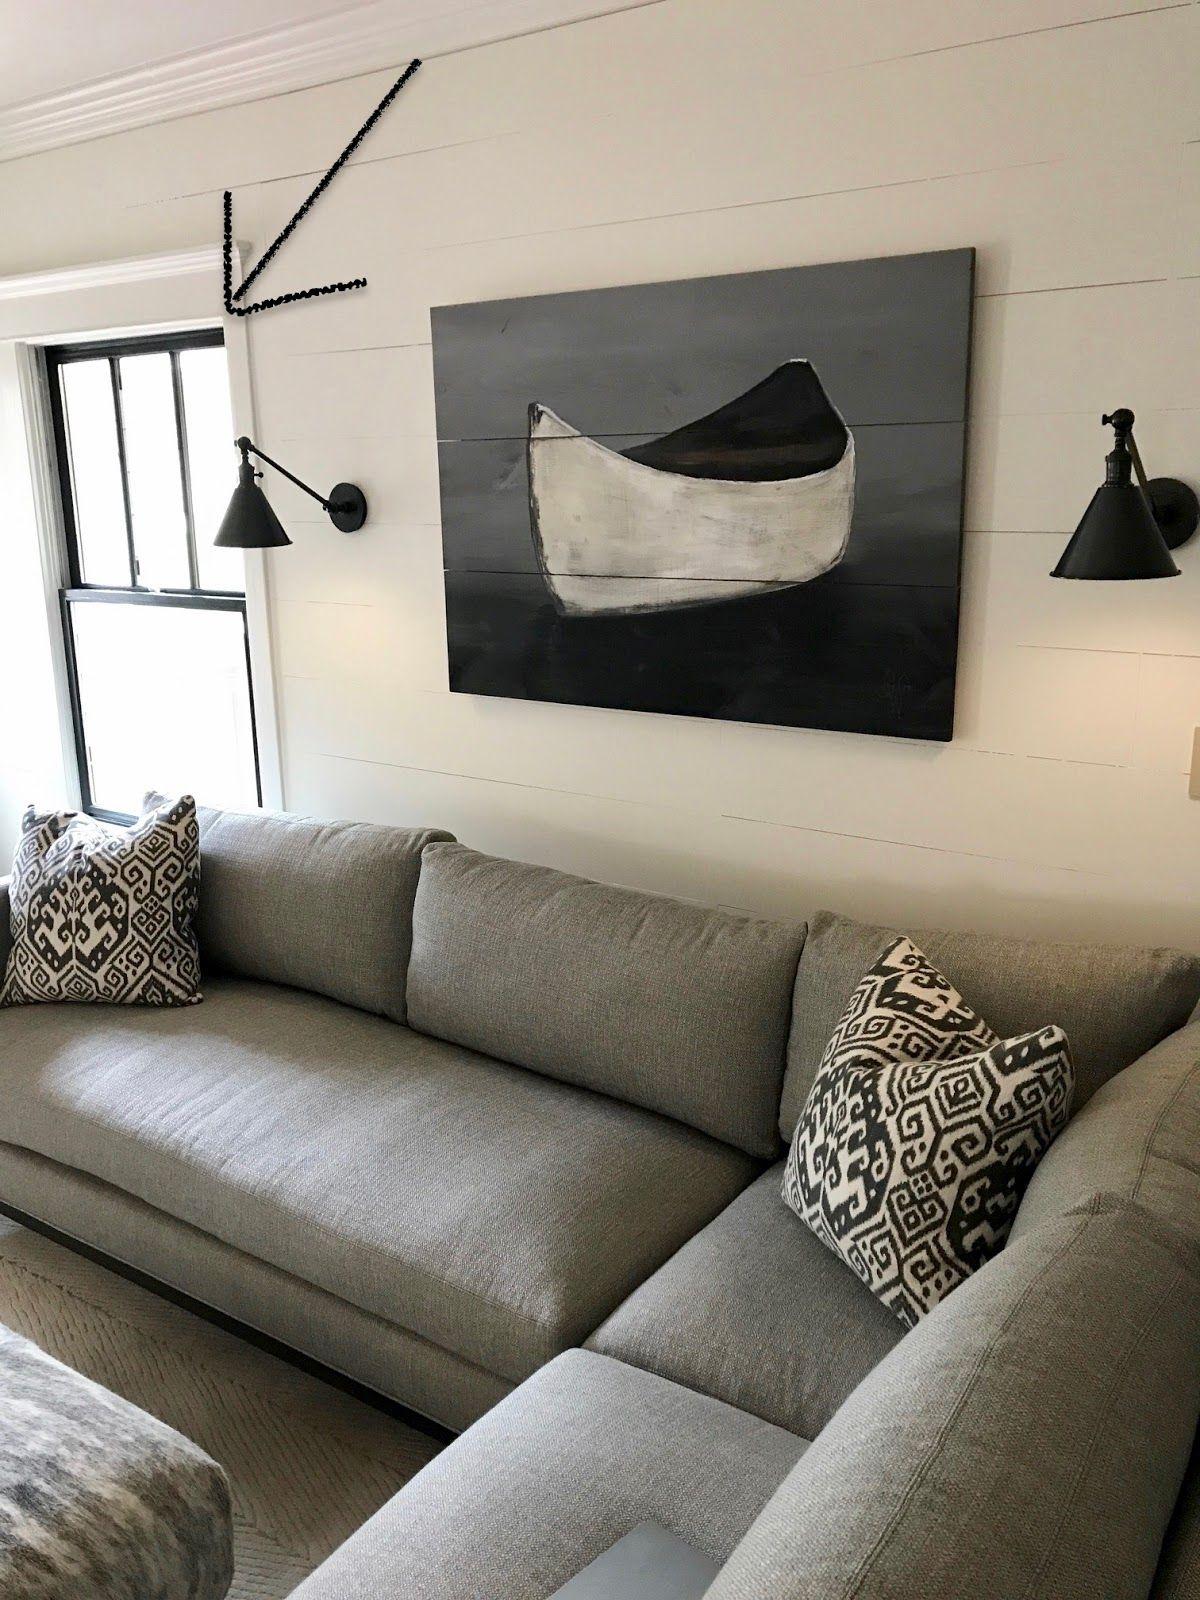 Lee Industries Sofa Artwork, Wall Sconces, Shiplap Wall